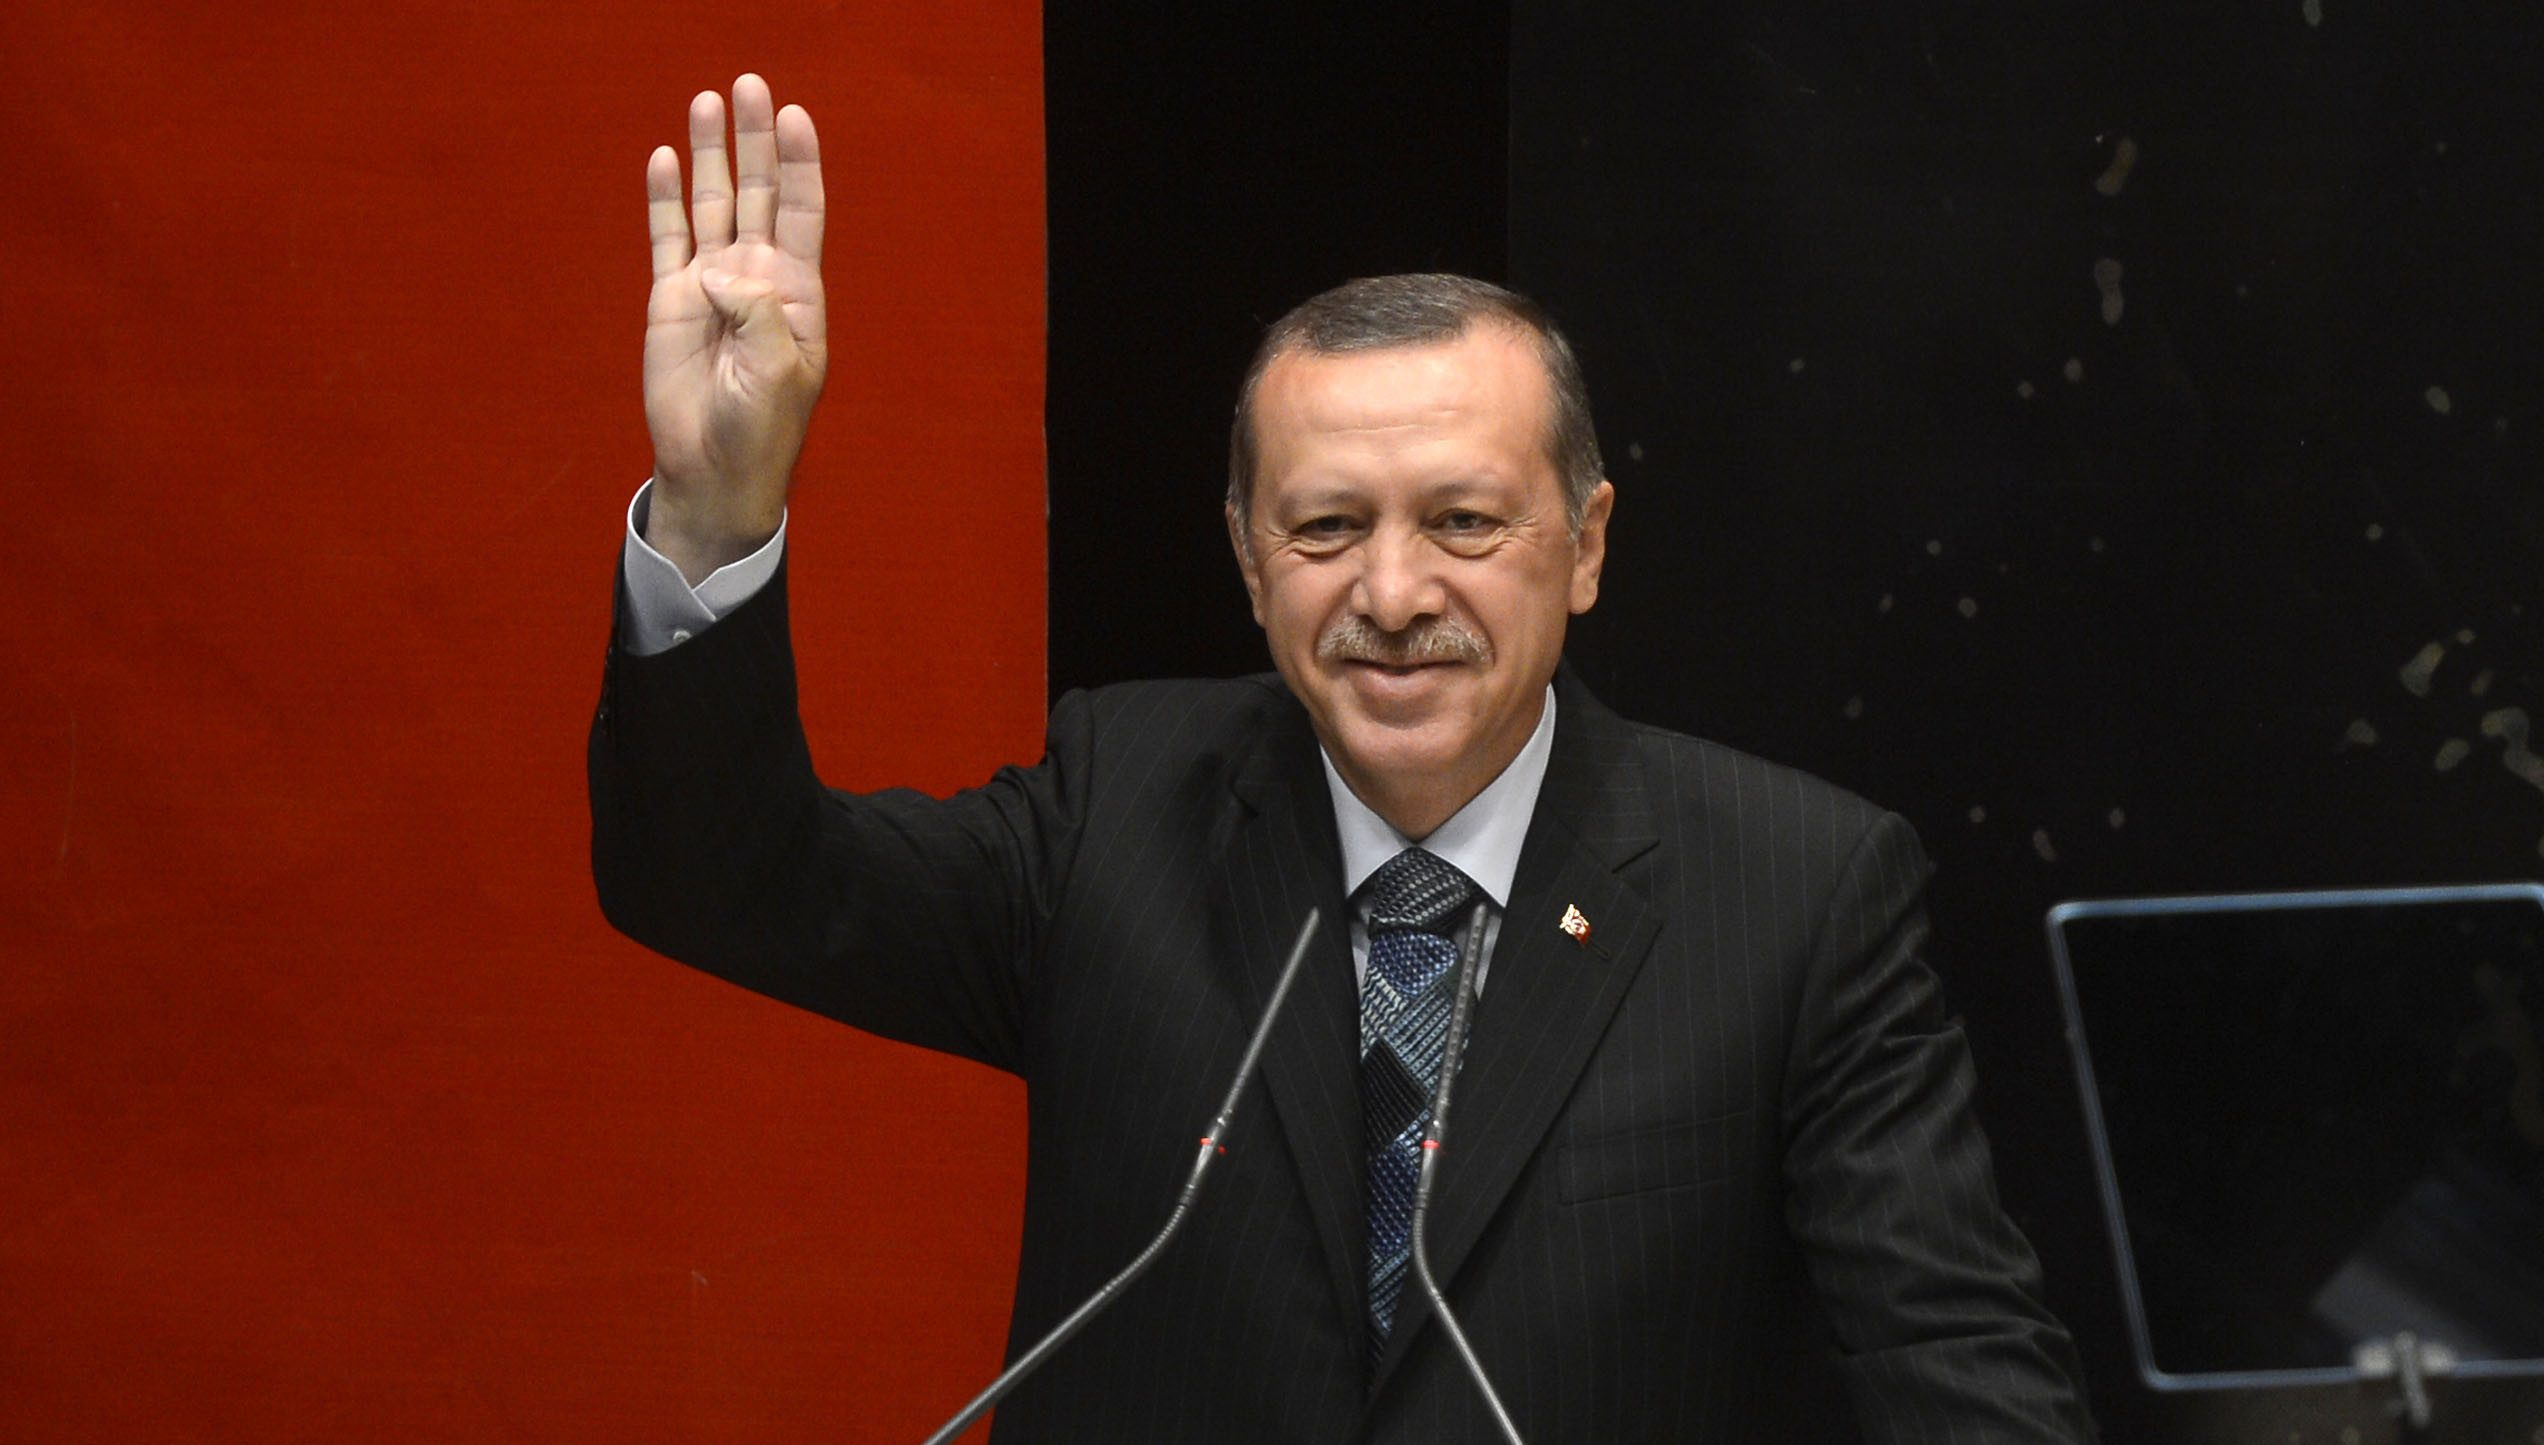 Erdogan in Turkey: A Dictatorship?